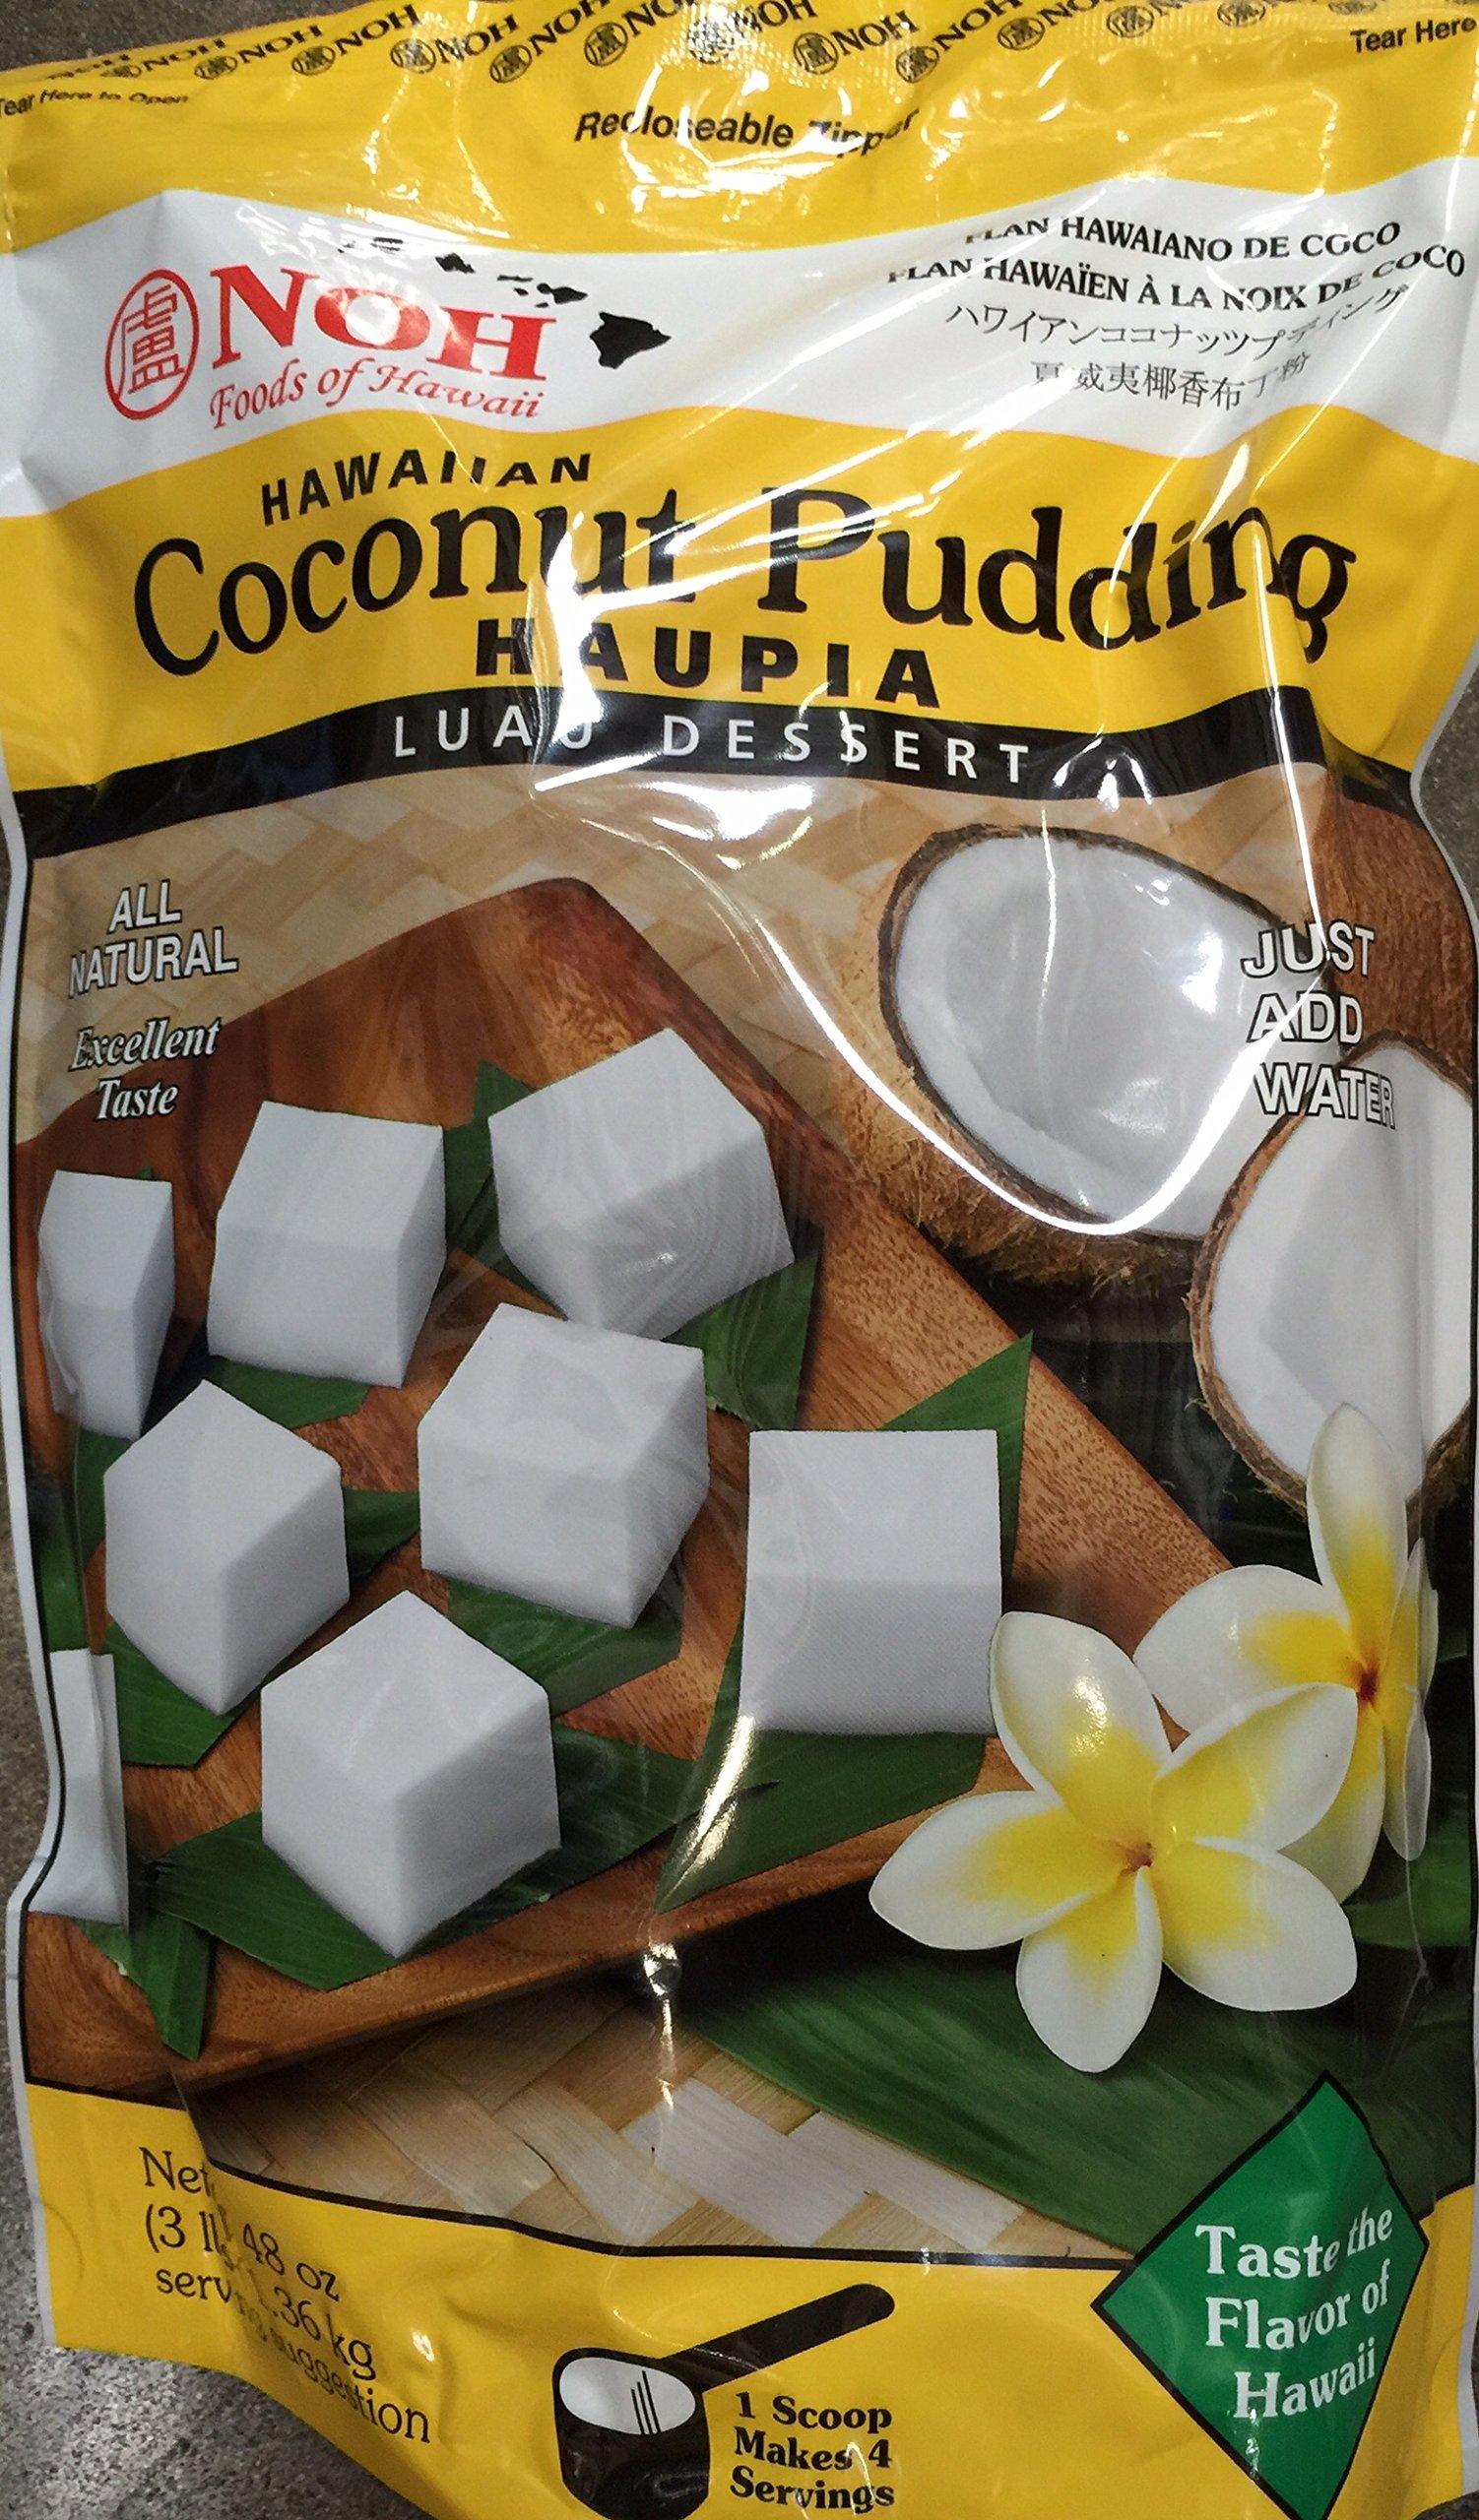 NOH Hawaiian Coconut Pudding Haupia Luau Dessert Mix Large 3 lb (48 oz-1.36 KG) pack Hawaiian Dessert by Noh Hawaii